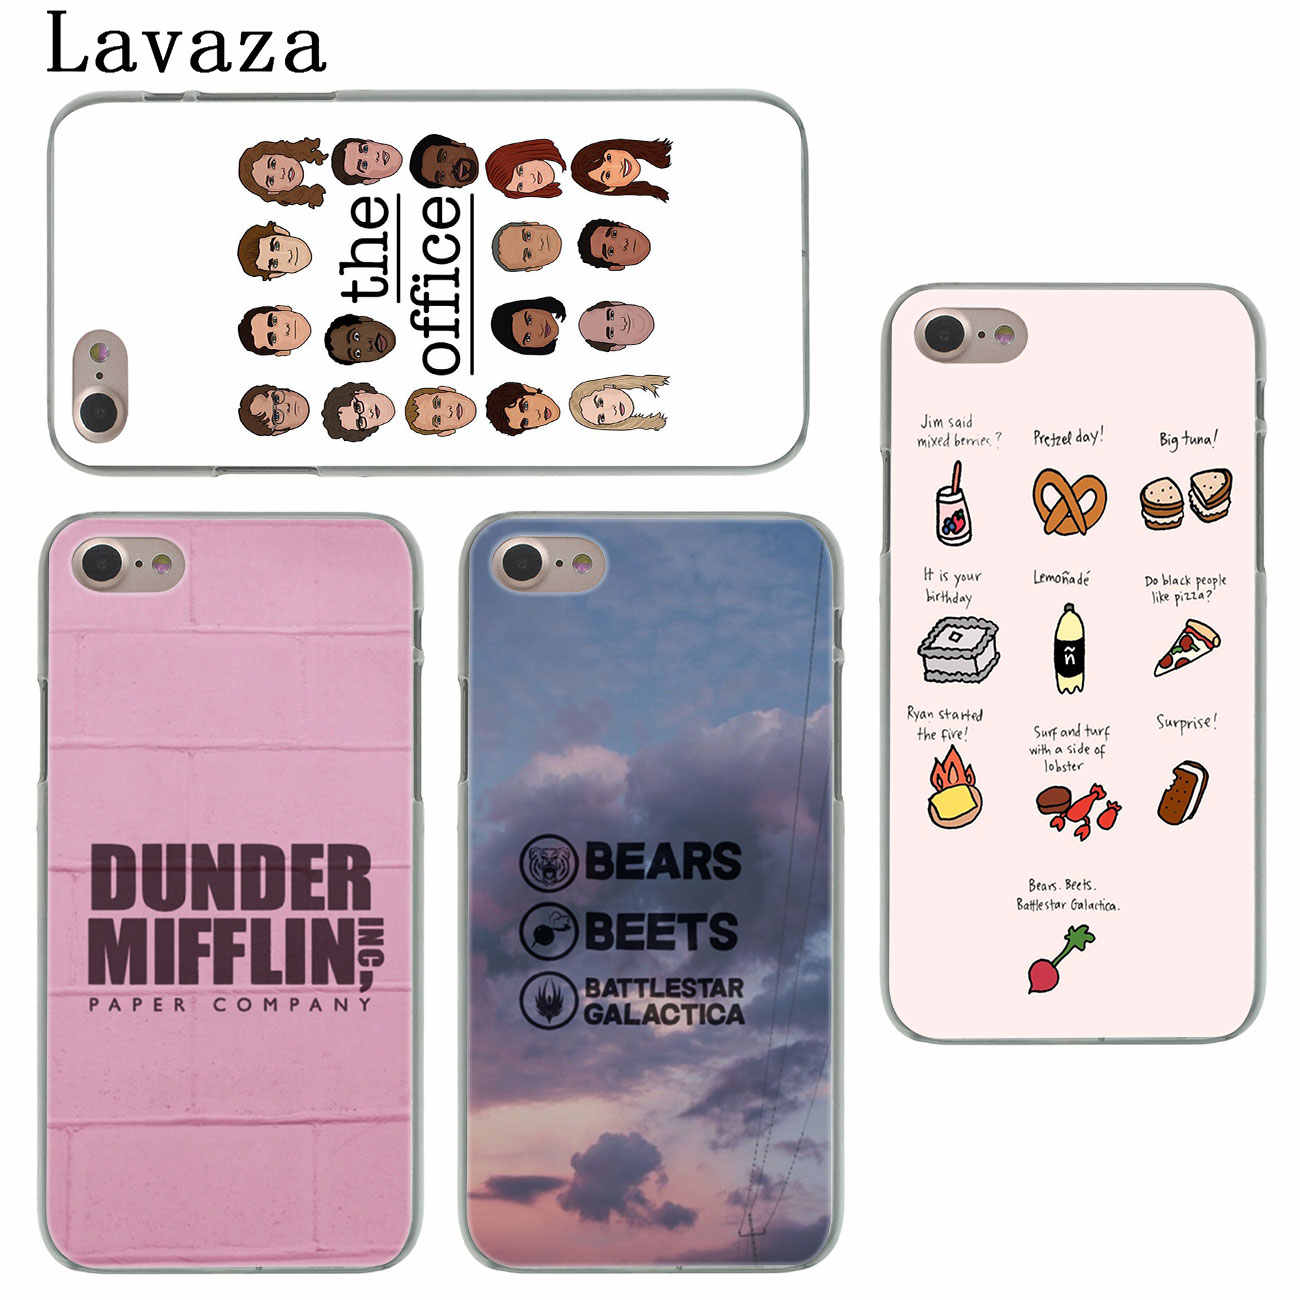 hot sale online 630f2 8f776 Lavaza TV the office cast meme Hard Cover Case for Apple iPhone X XS Max XR  6 6S 7 8 Plus 5 5S SE 5C 4S 10 Phone Cases